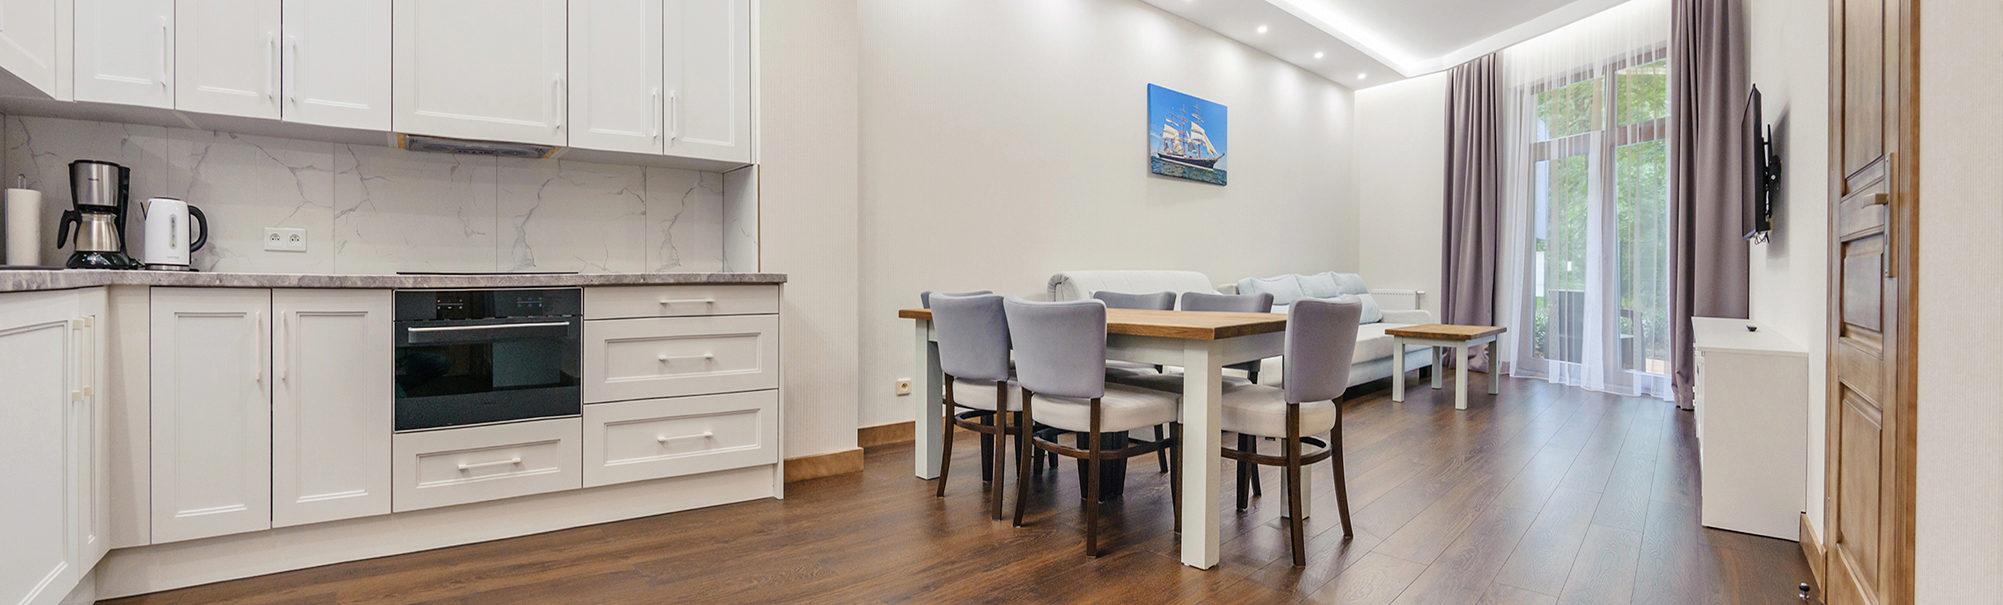 Apartamenty Sun&Snow Apartament Delux A 1 Hel - Cypel Helski